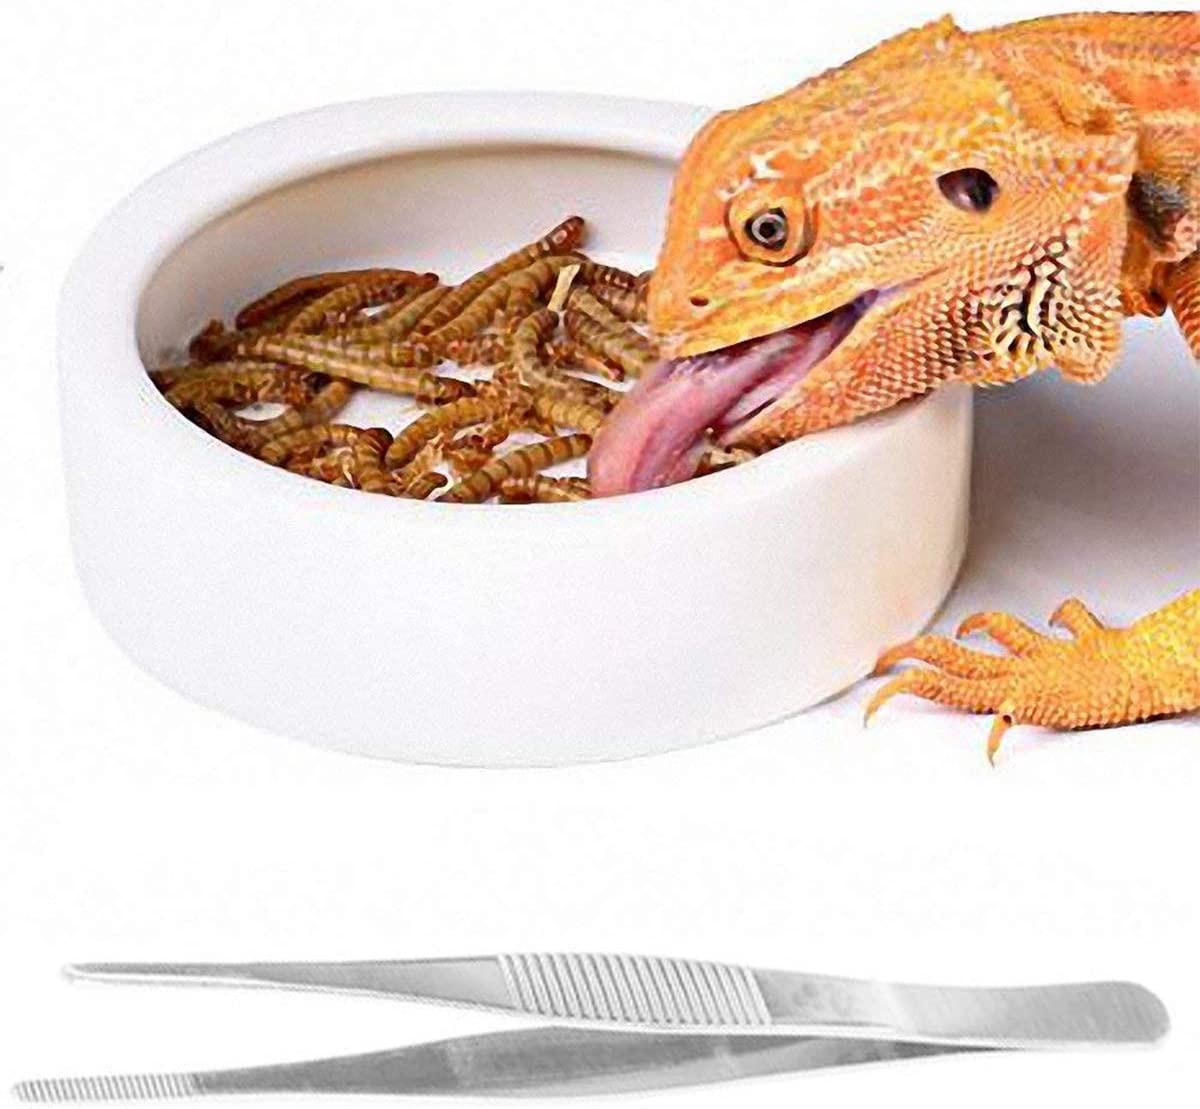 Reptile Dish with Feeding Tweezers Tongs, Ceramic Reptile Feeding Bowl-M